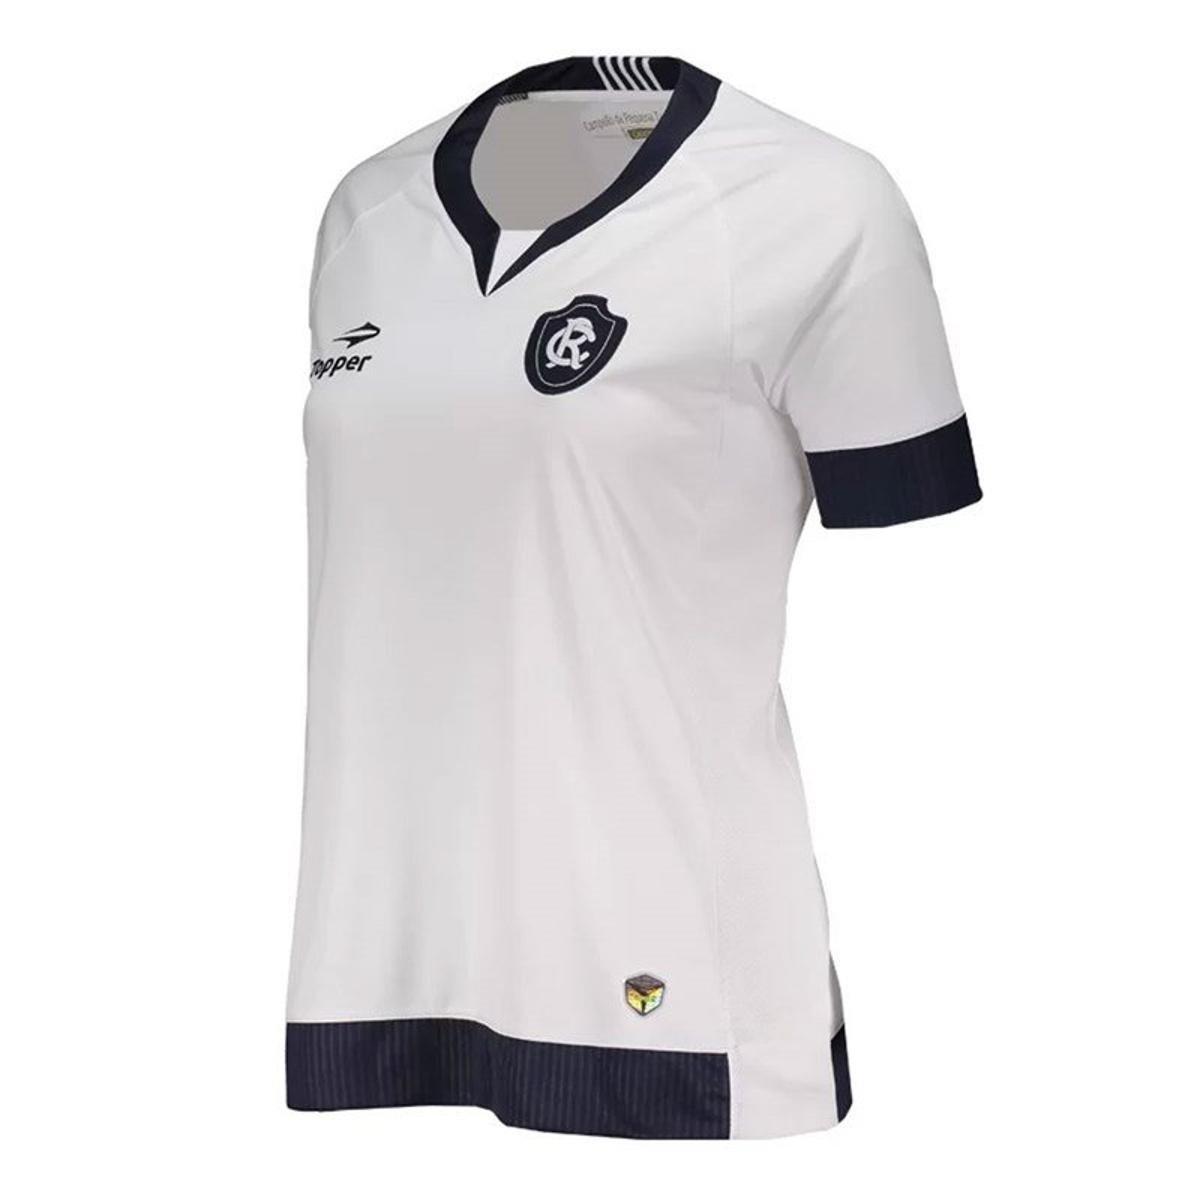 Camisa Topper Remo Away Feminina - Branco - Compre Agora  bb4d551adabda